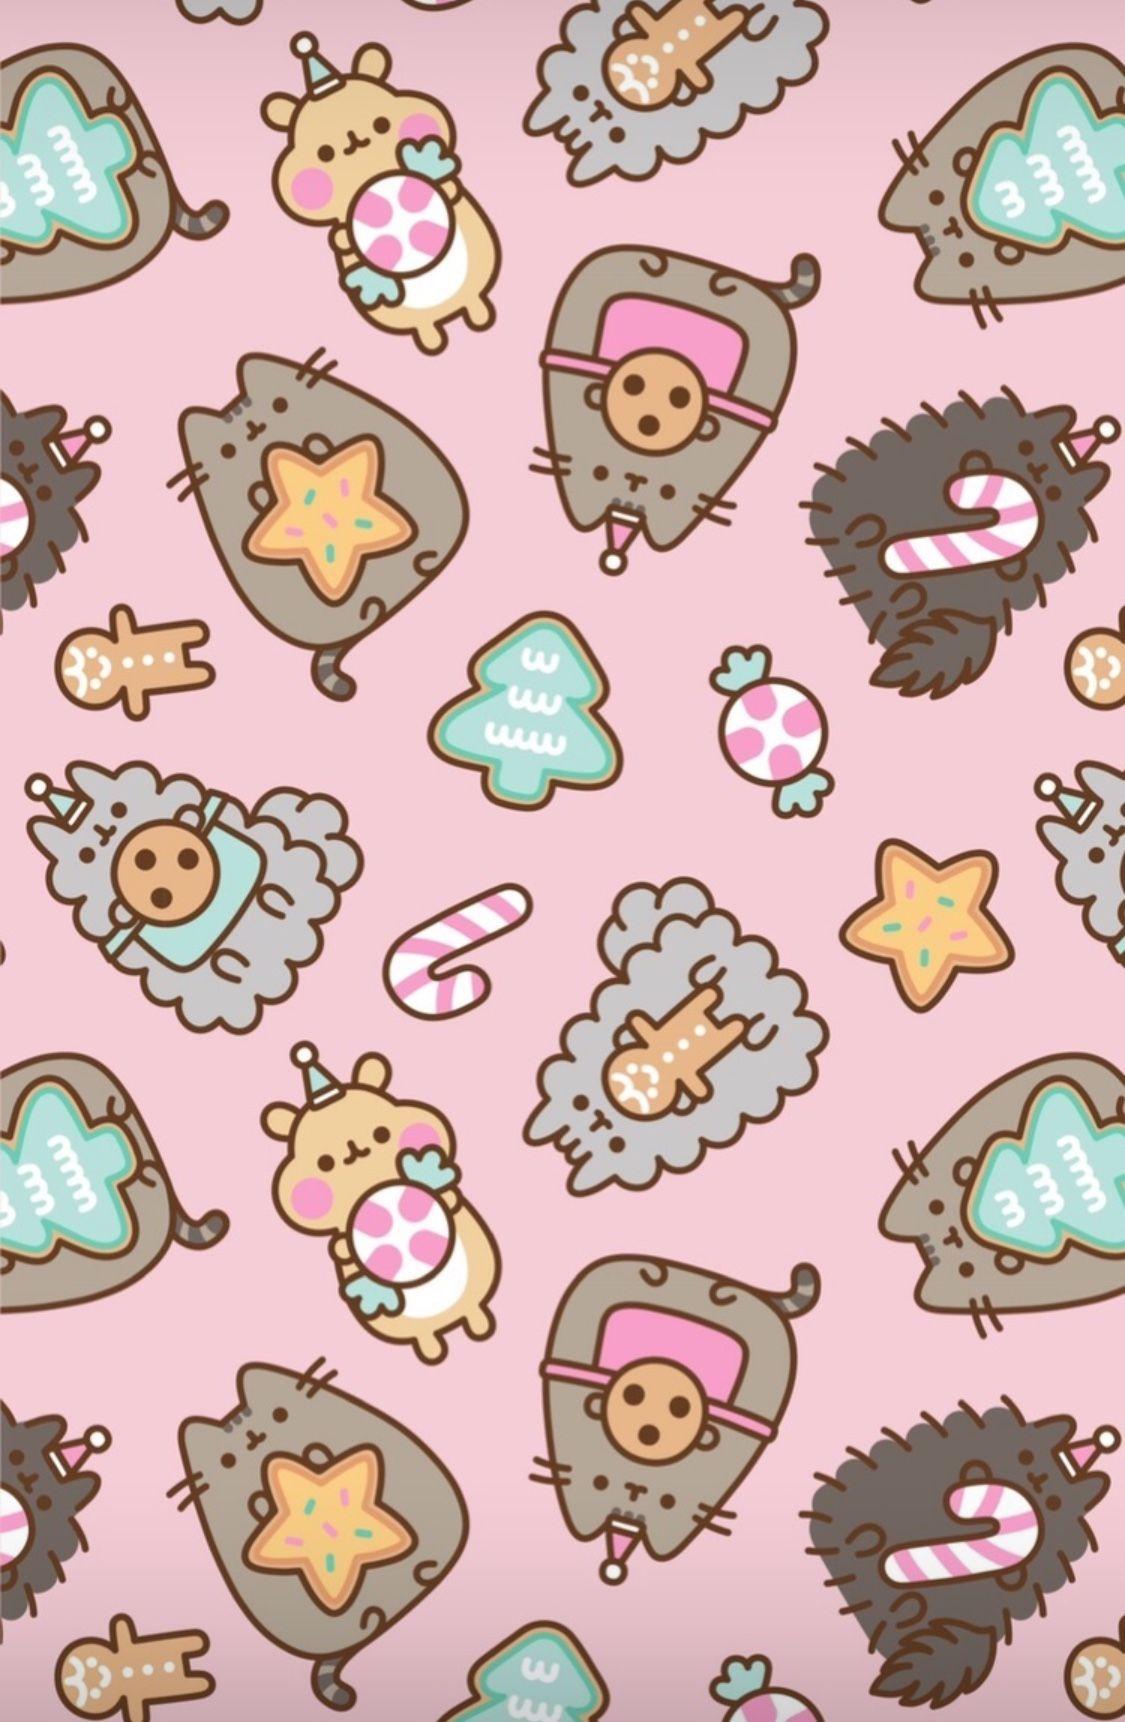 Christmas pusheen cookie baking 😍 Cat phone wallpaper